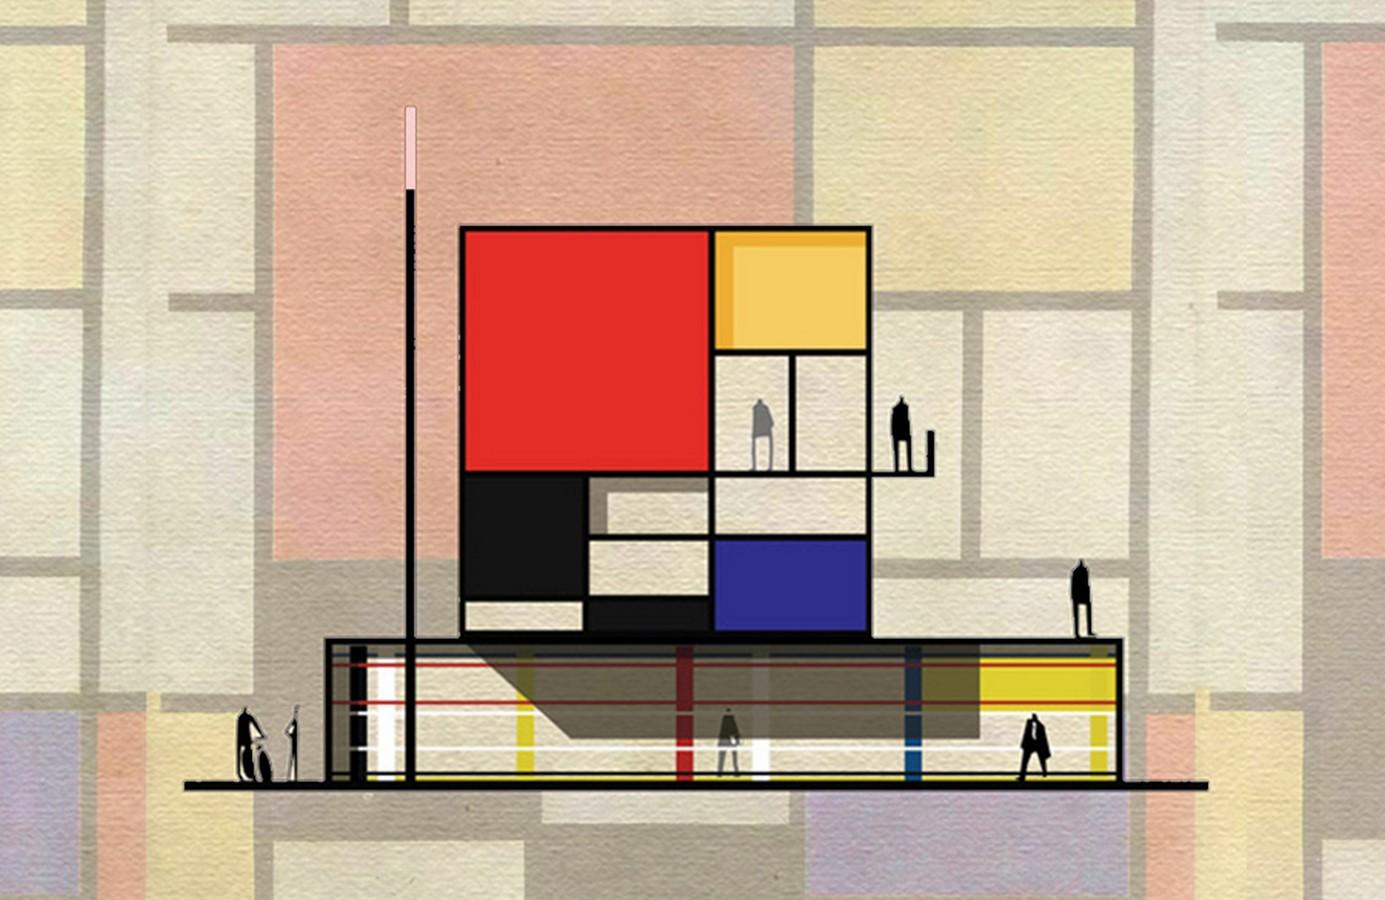 Is Architecture Still Considered an Art? - Sheet2